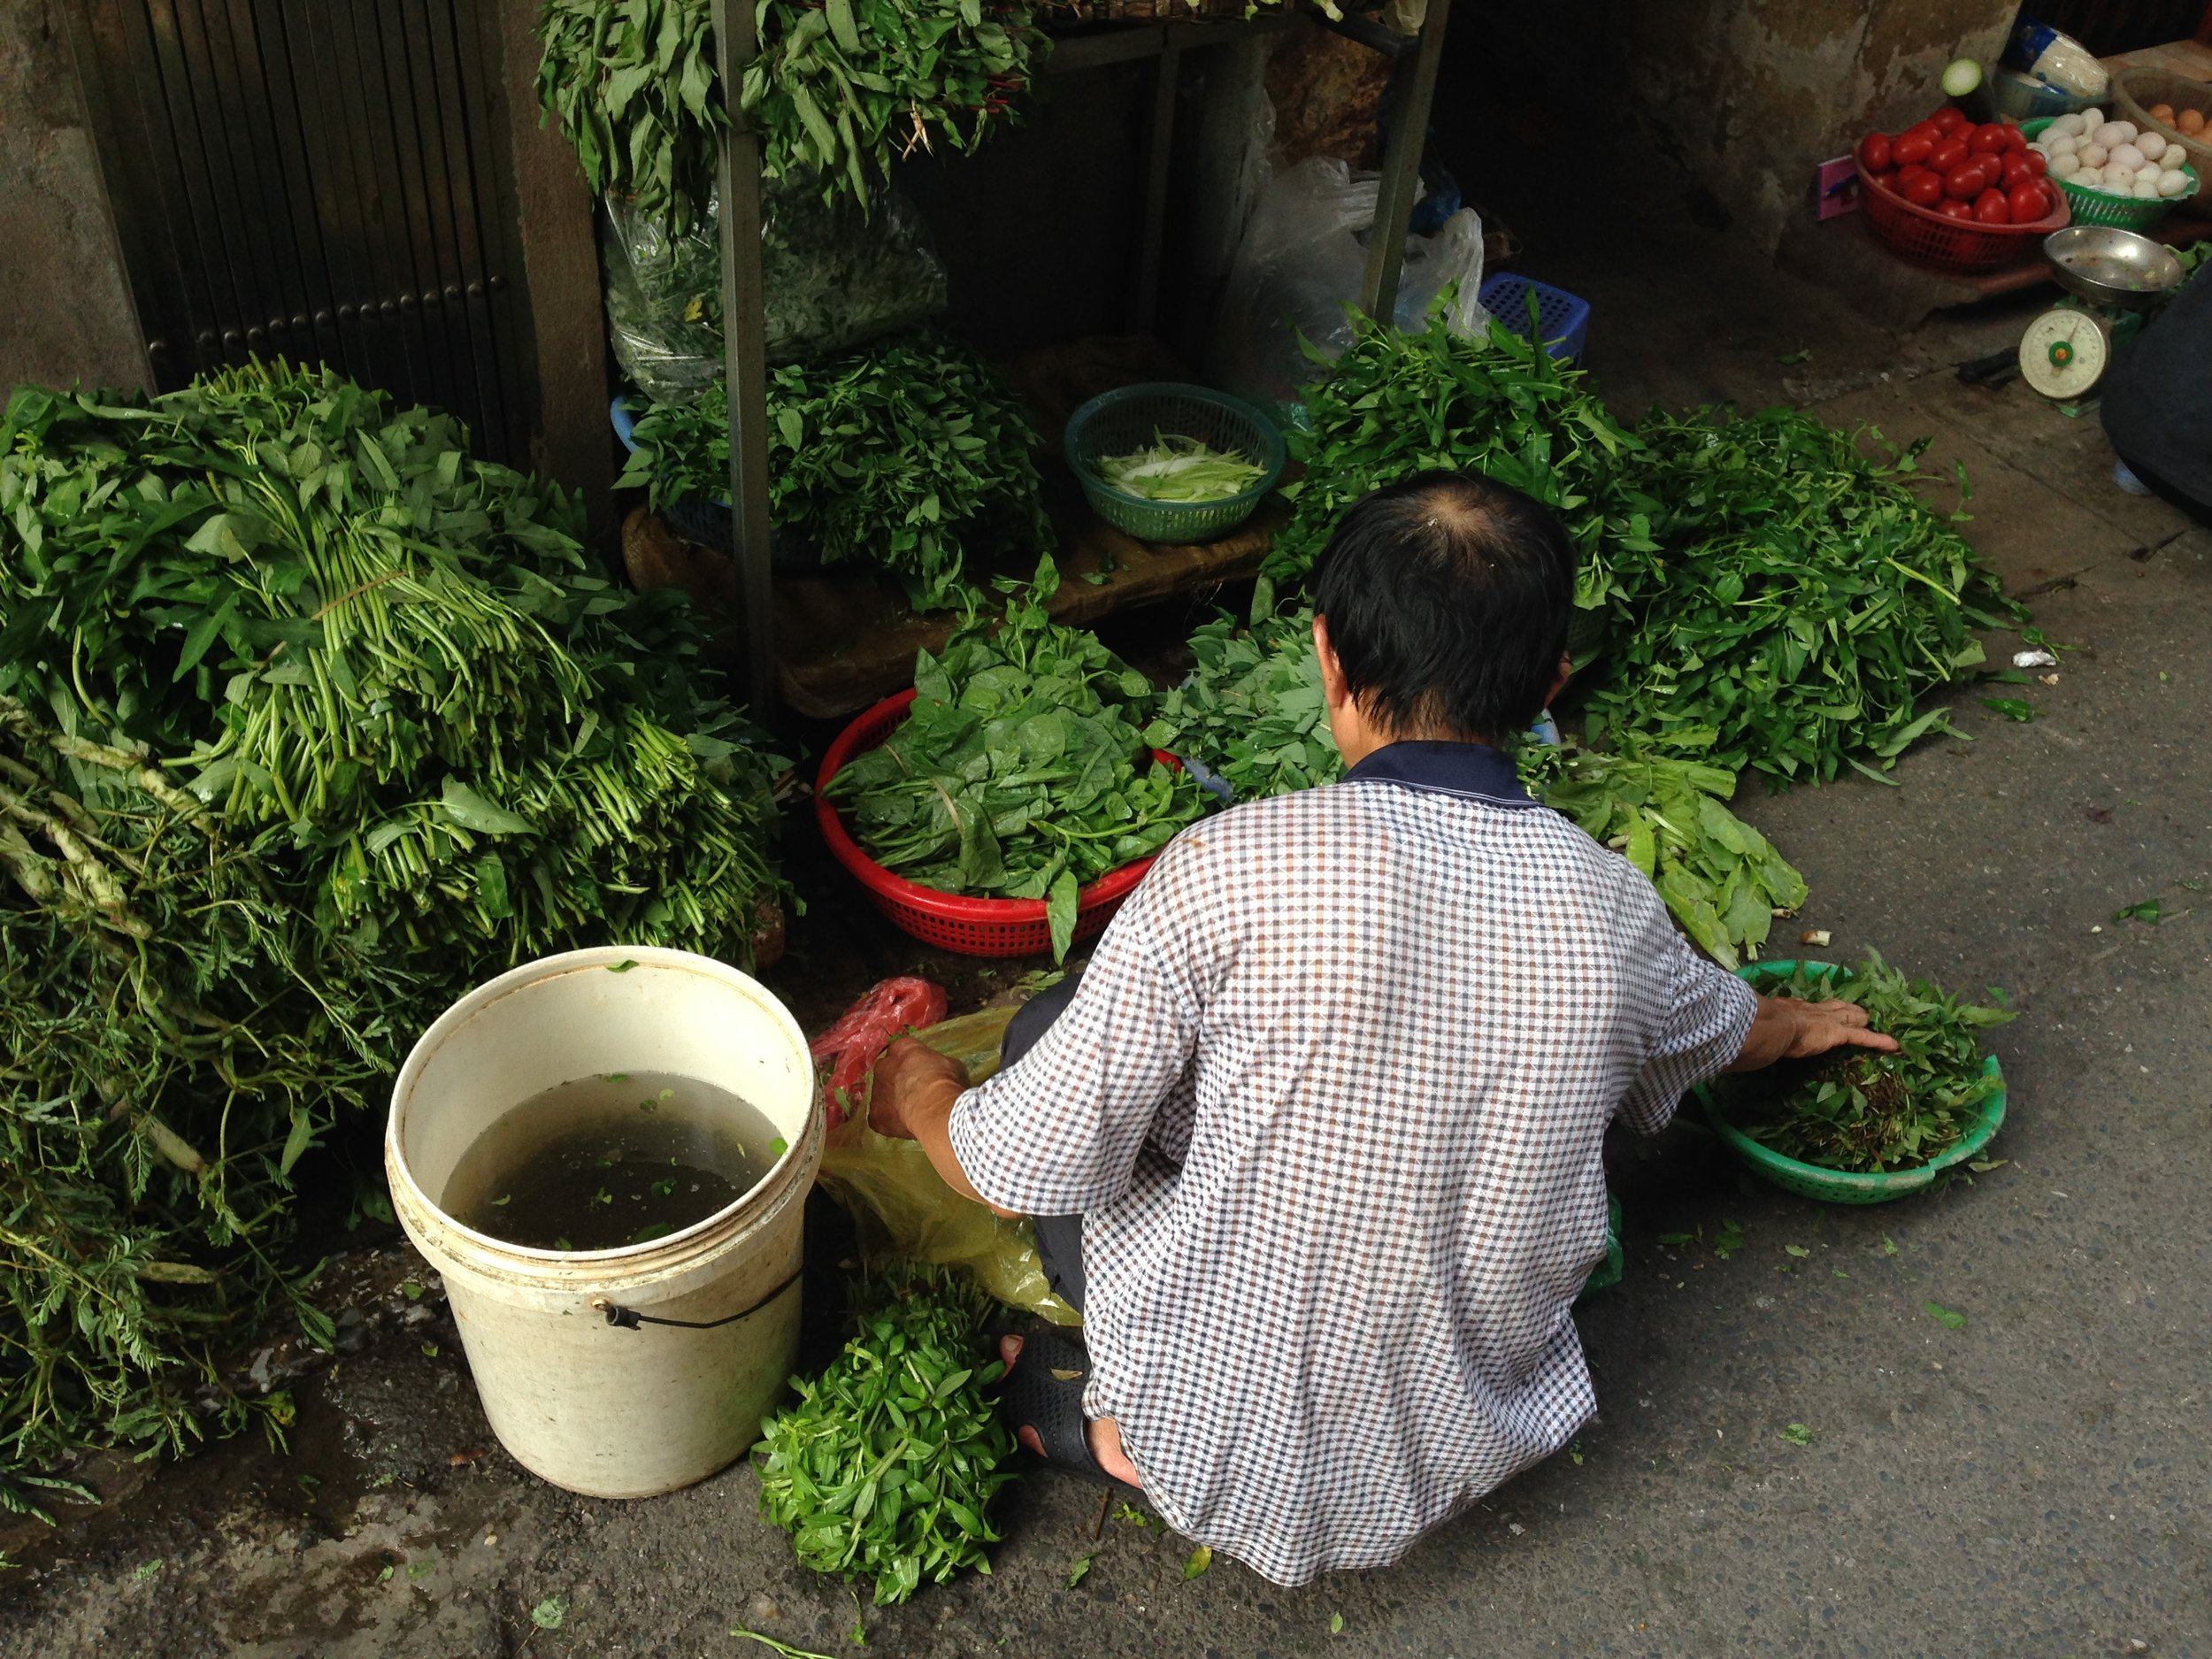 Man peeling vegetables in street, Hanoi, Vietnam - illumelation.com